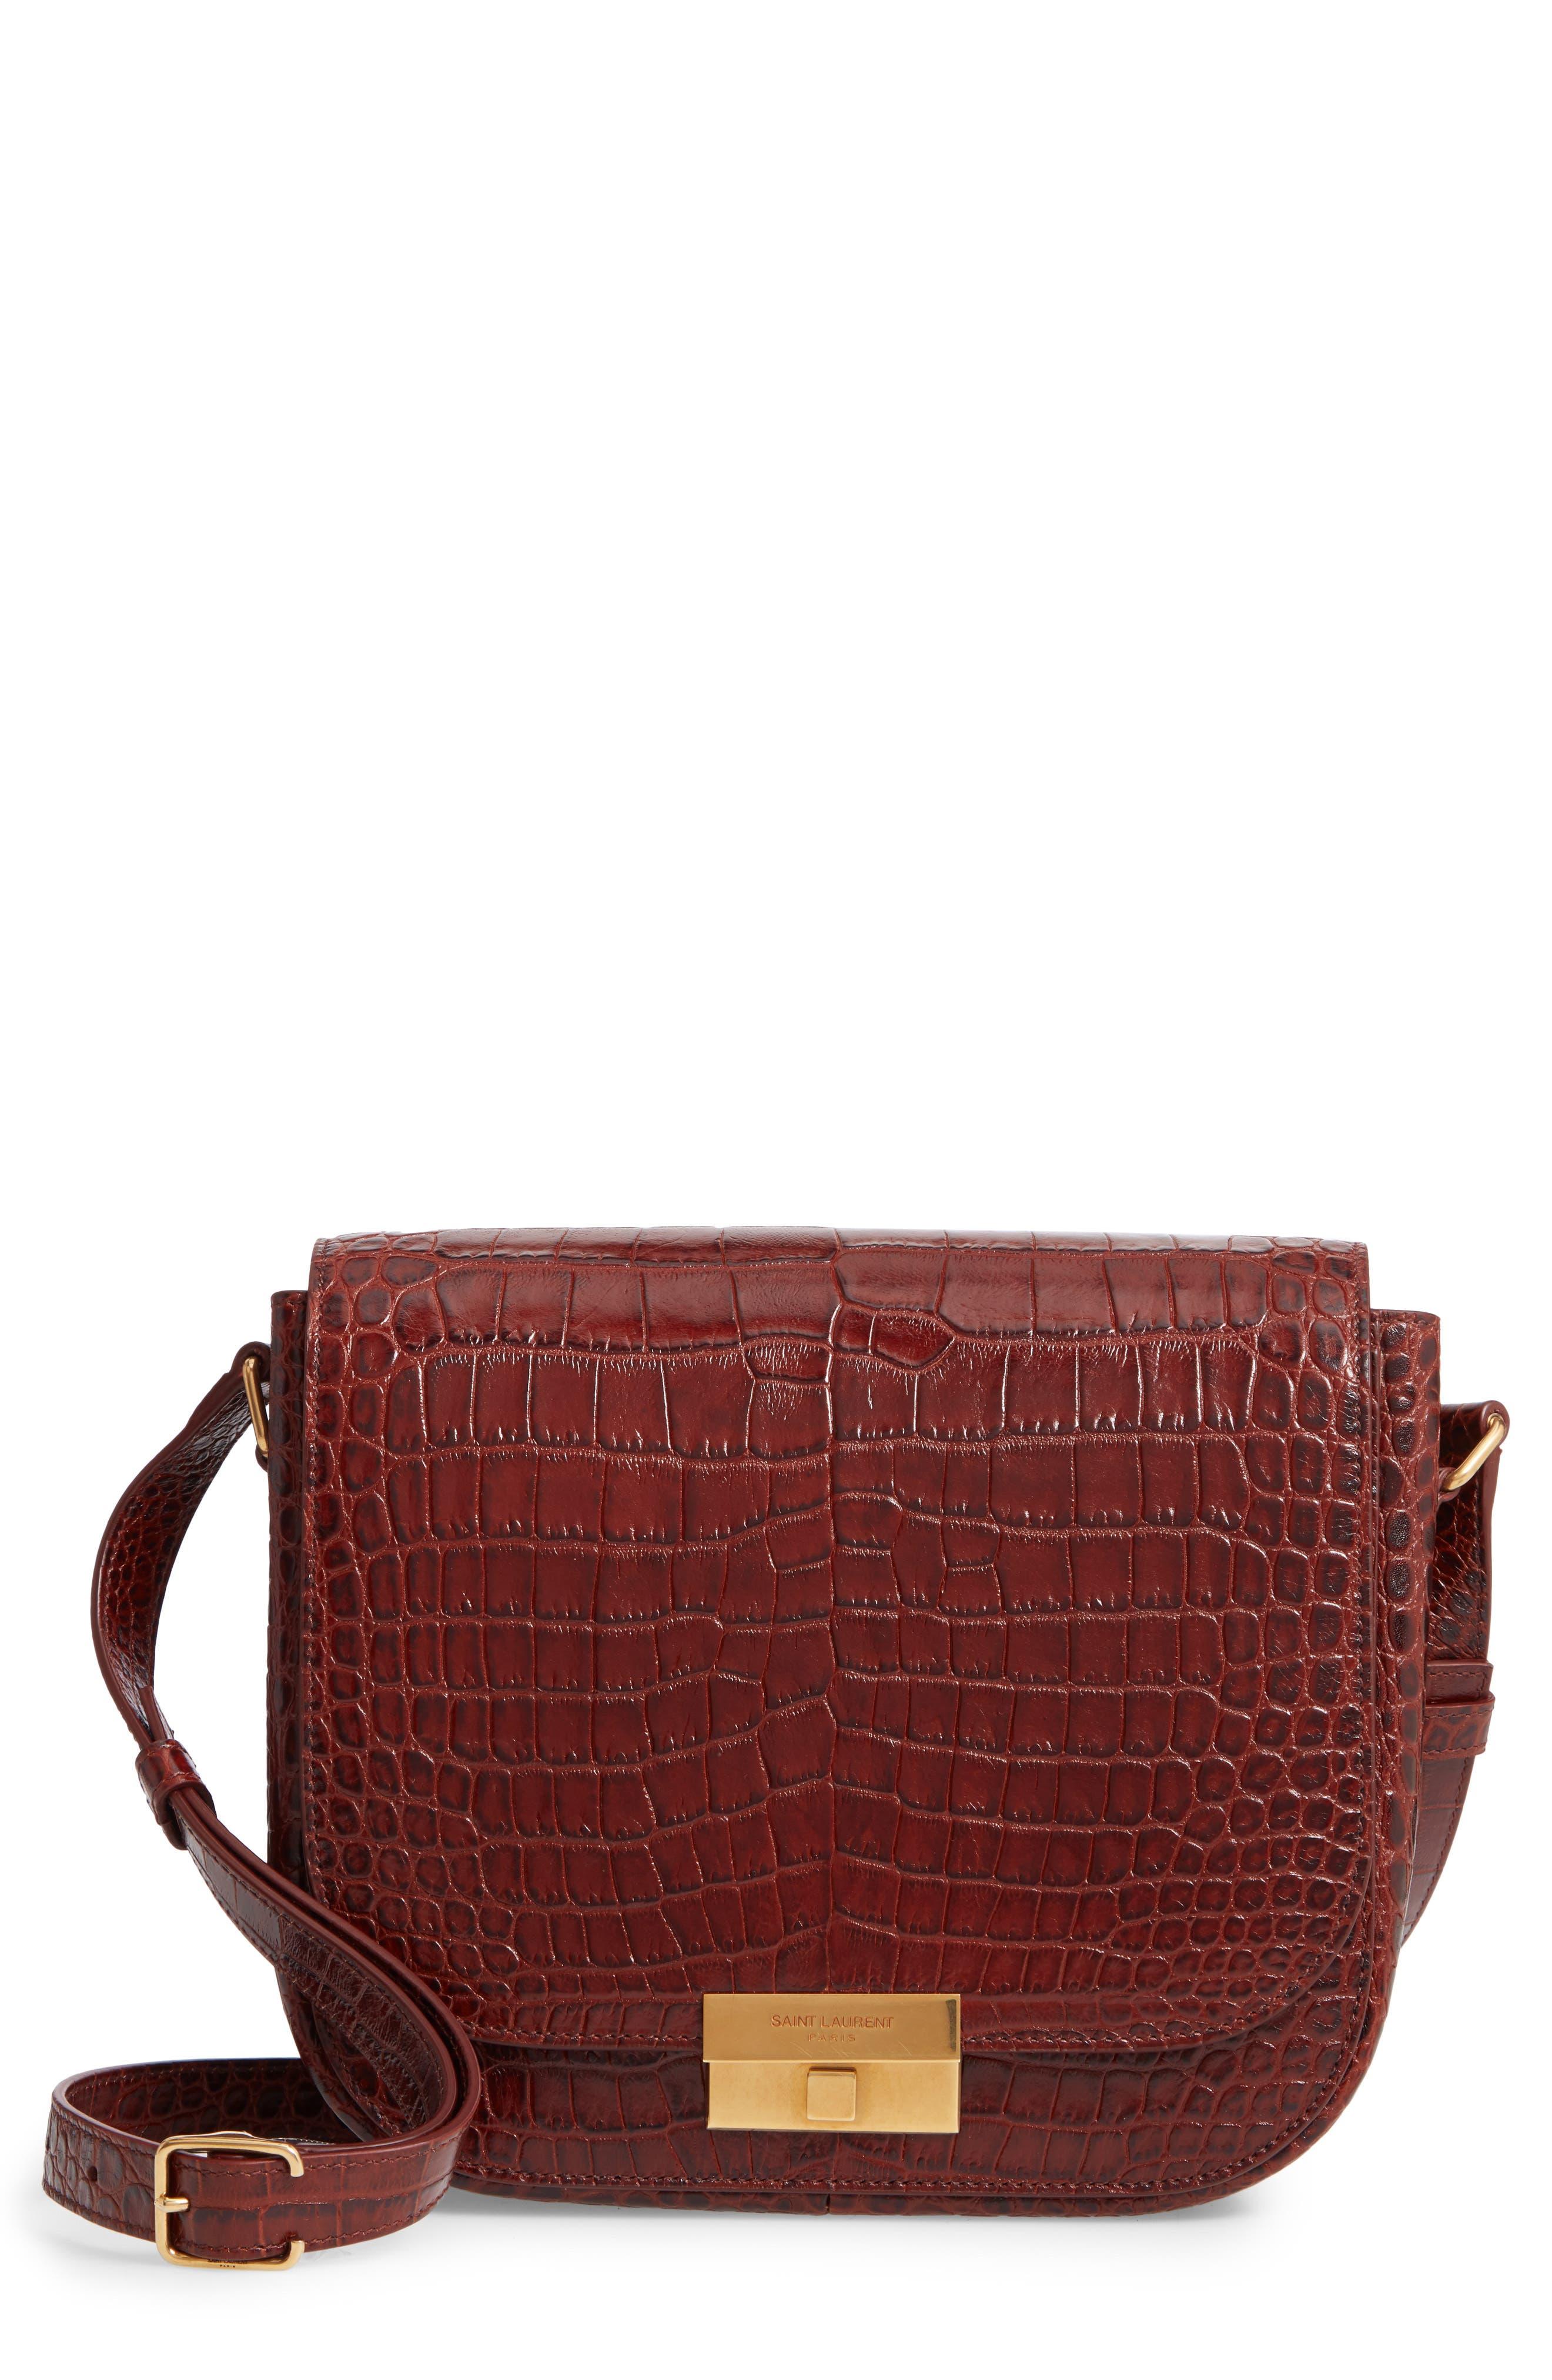 Betty Croc Embossed Leather Shoulder Bag,                             Main thumbnail 1, color,                             DARK BLOOD